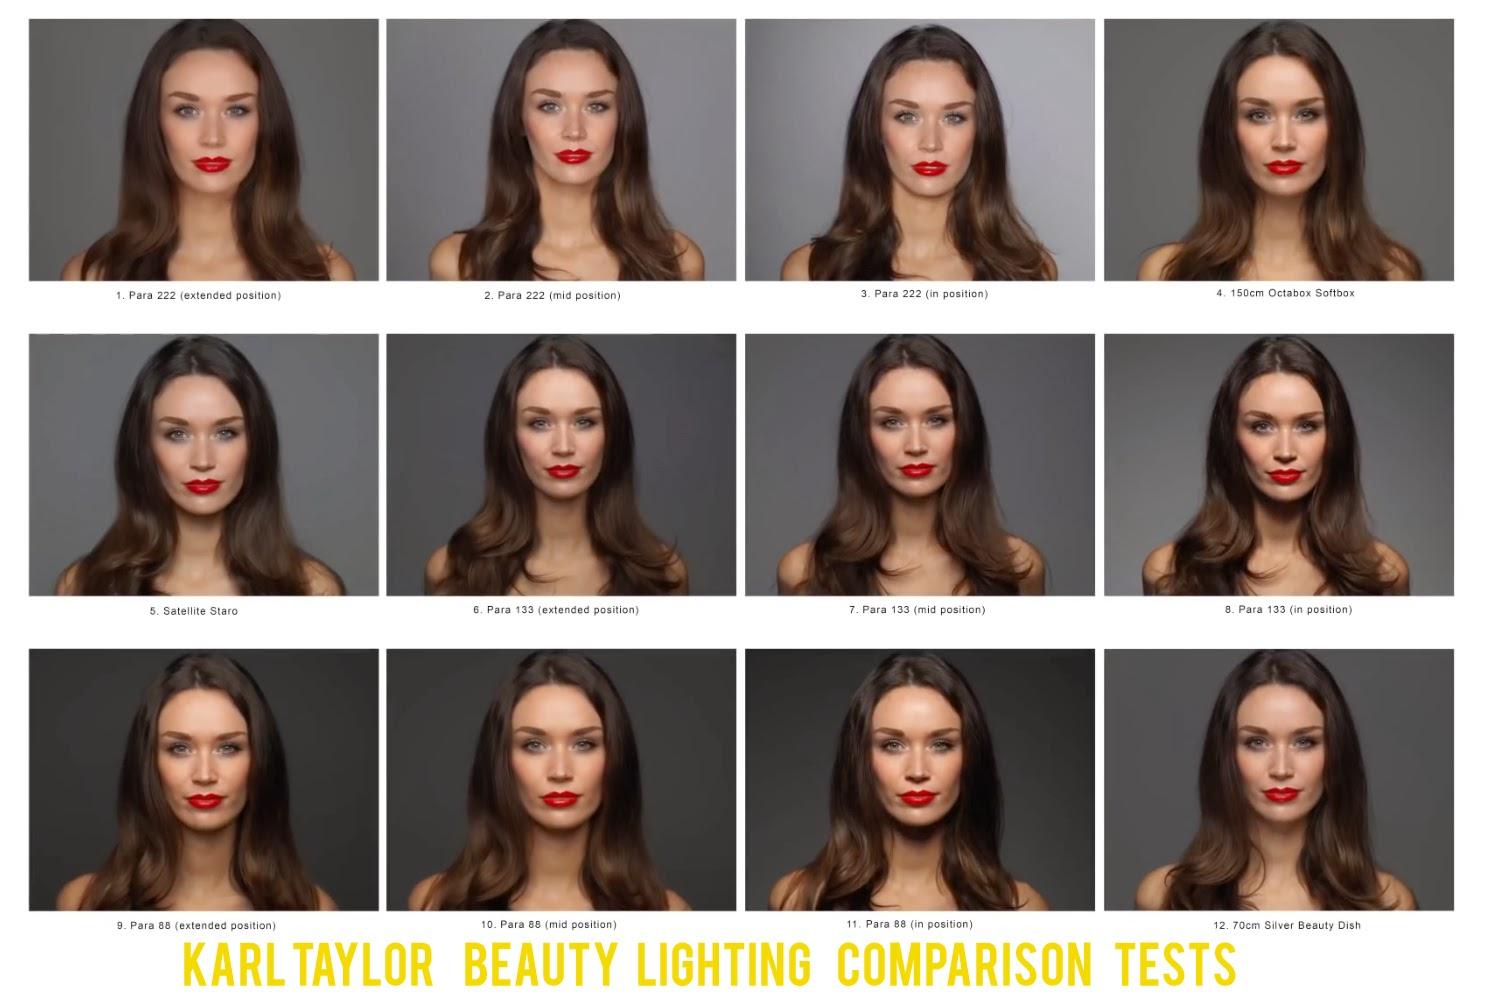 Beauty Lighting Comparison Tests: Broncolor Parabolic vs Beauty Dish vs Octabox by Karl Taylor